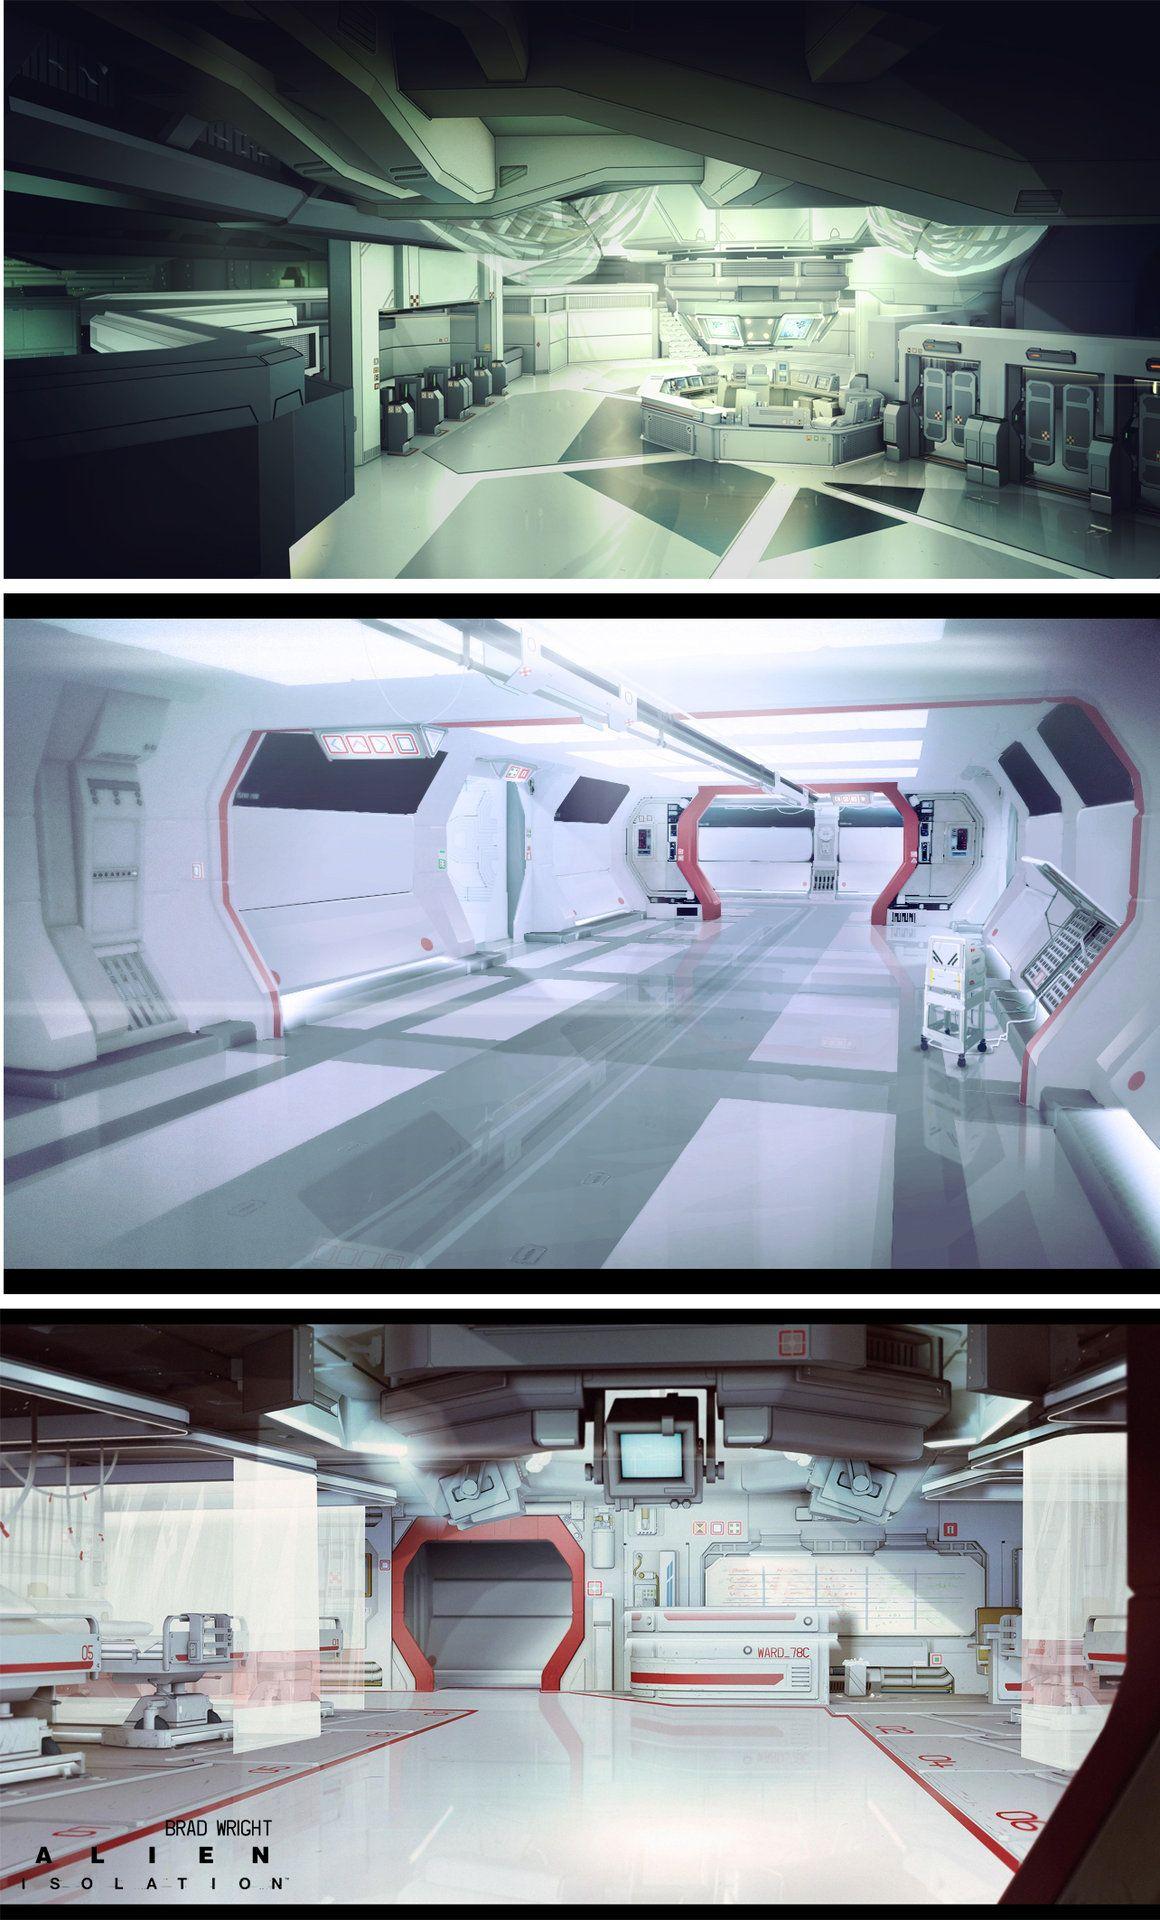 Artstation Alien Isolation Concept Art 05 Brad Wright 画像